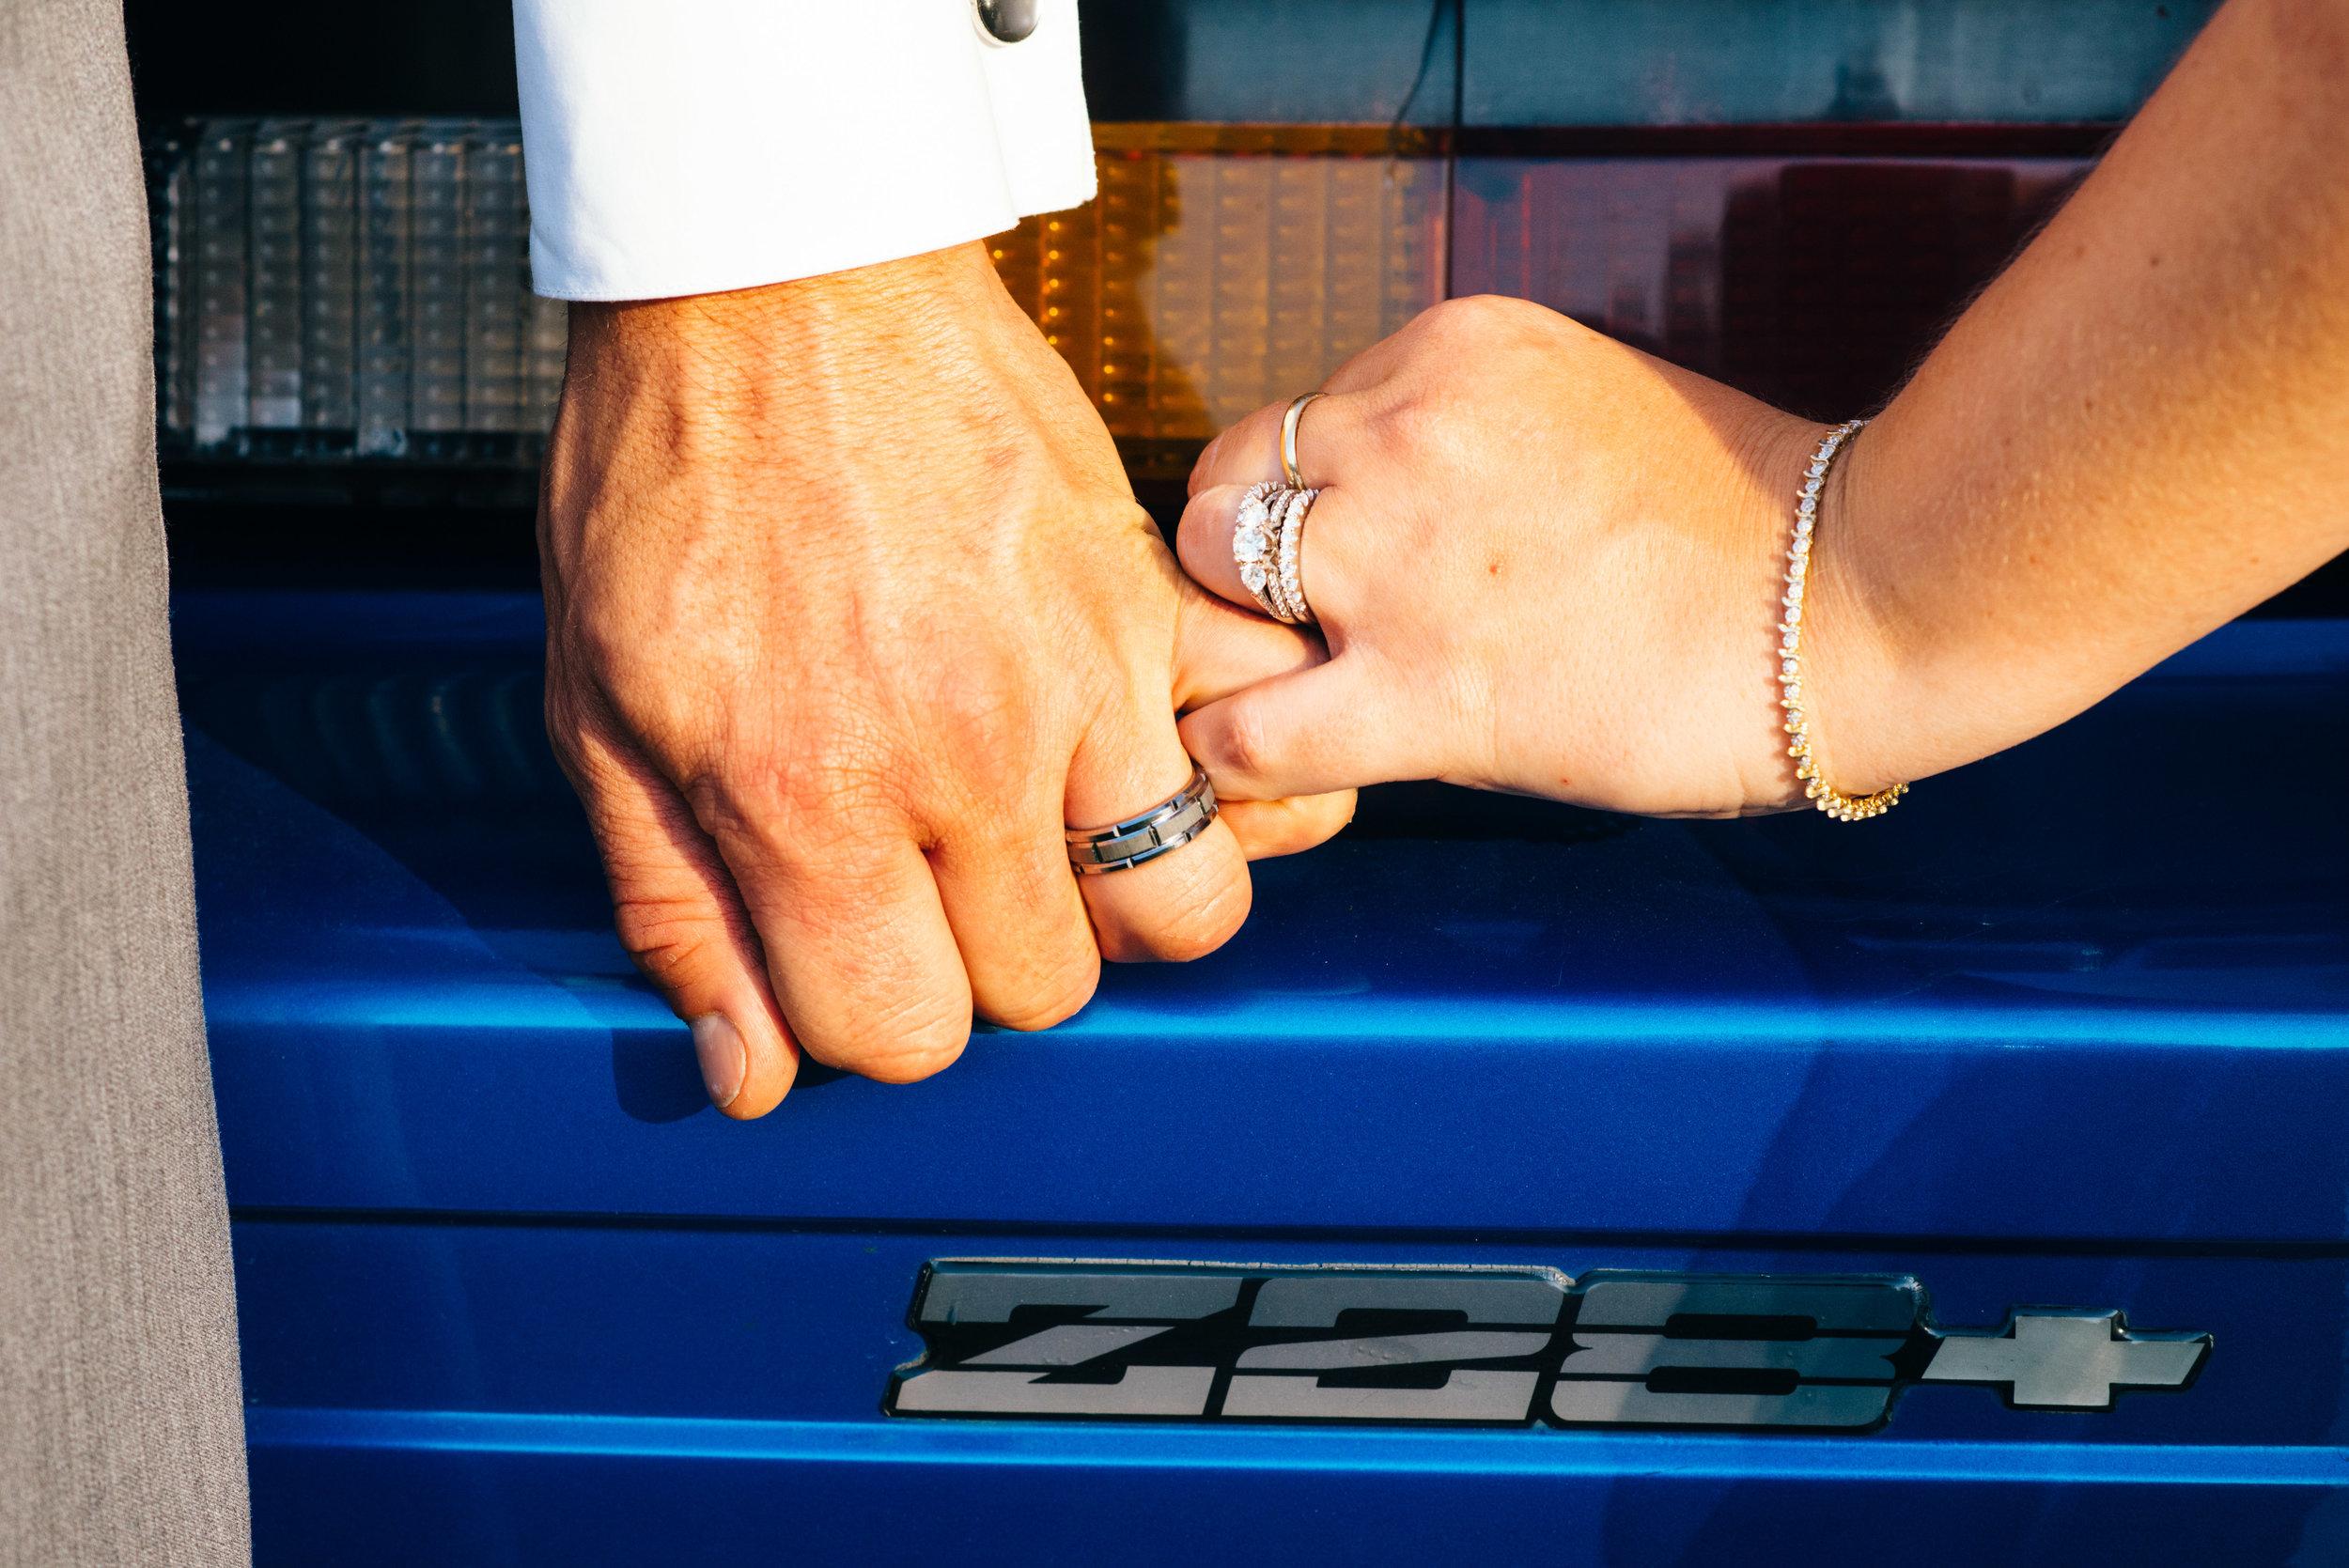 Bride and groom pinky swear near grooms roayl blue z28 classic camaro